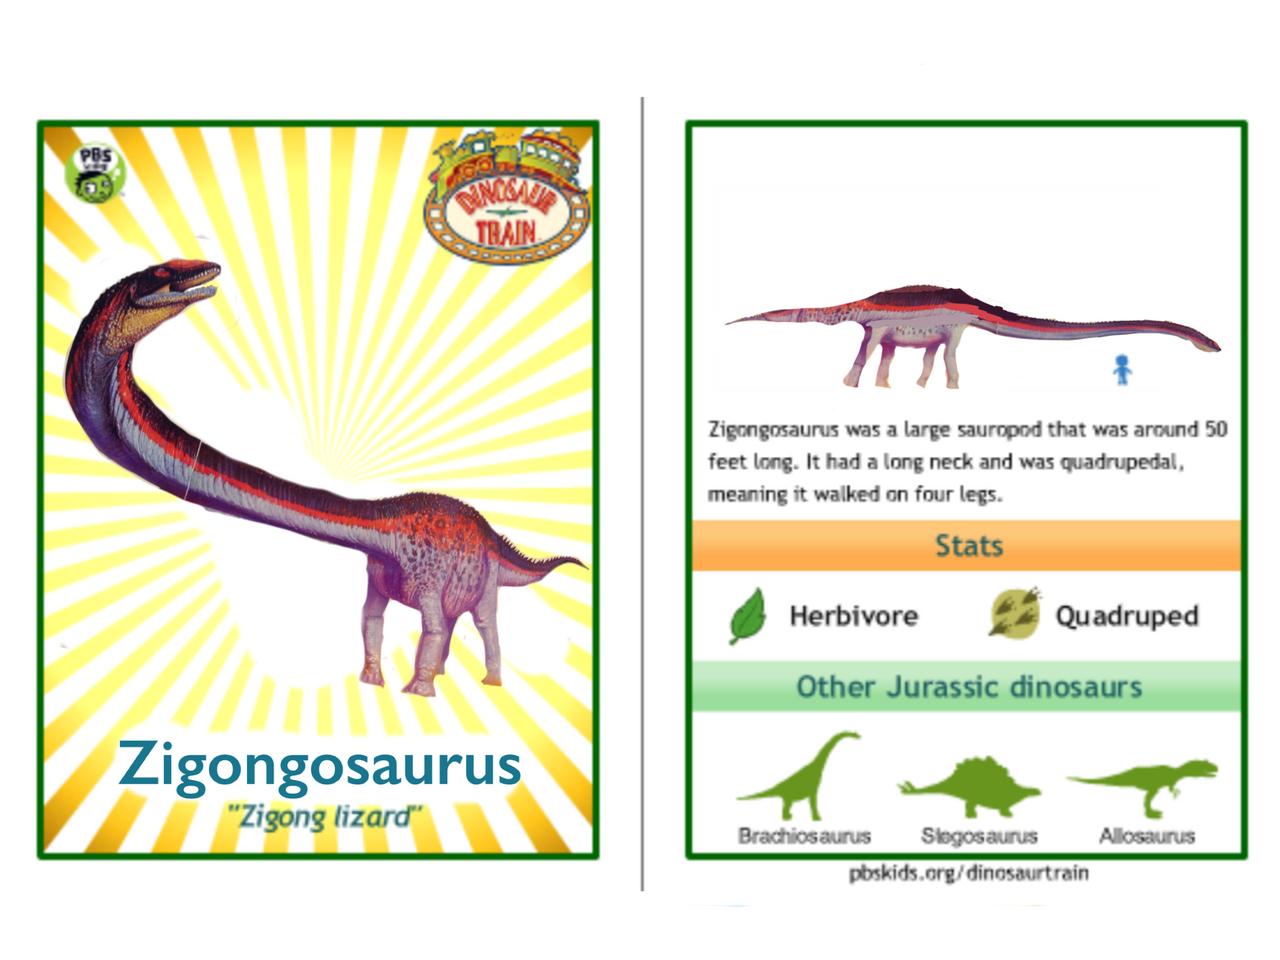 Dinosaur Train Zigongosaurus card by Vespisaurus on DeviantArt